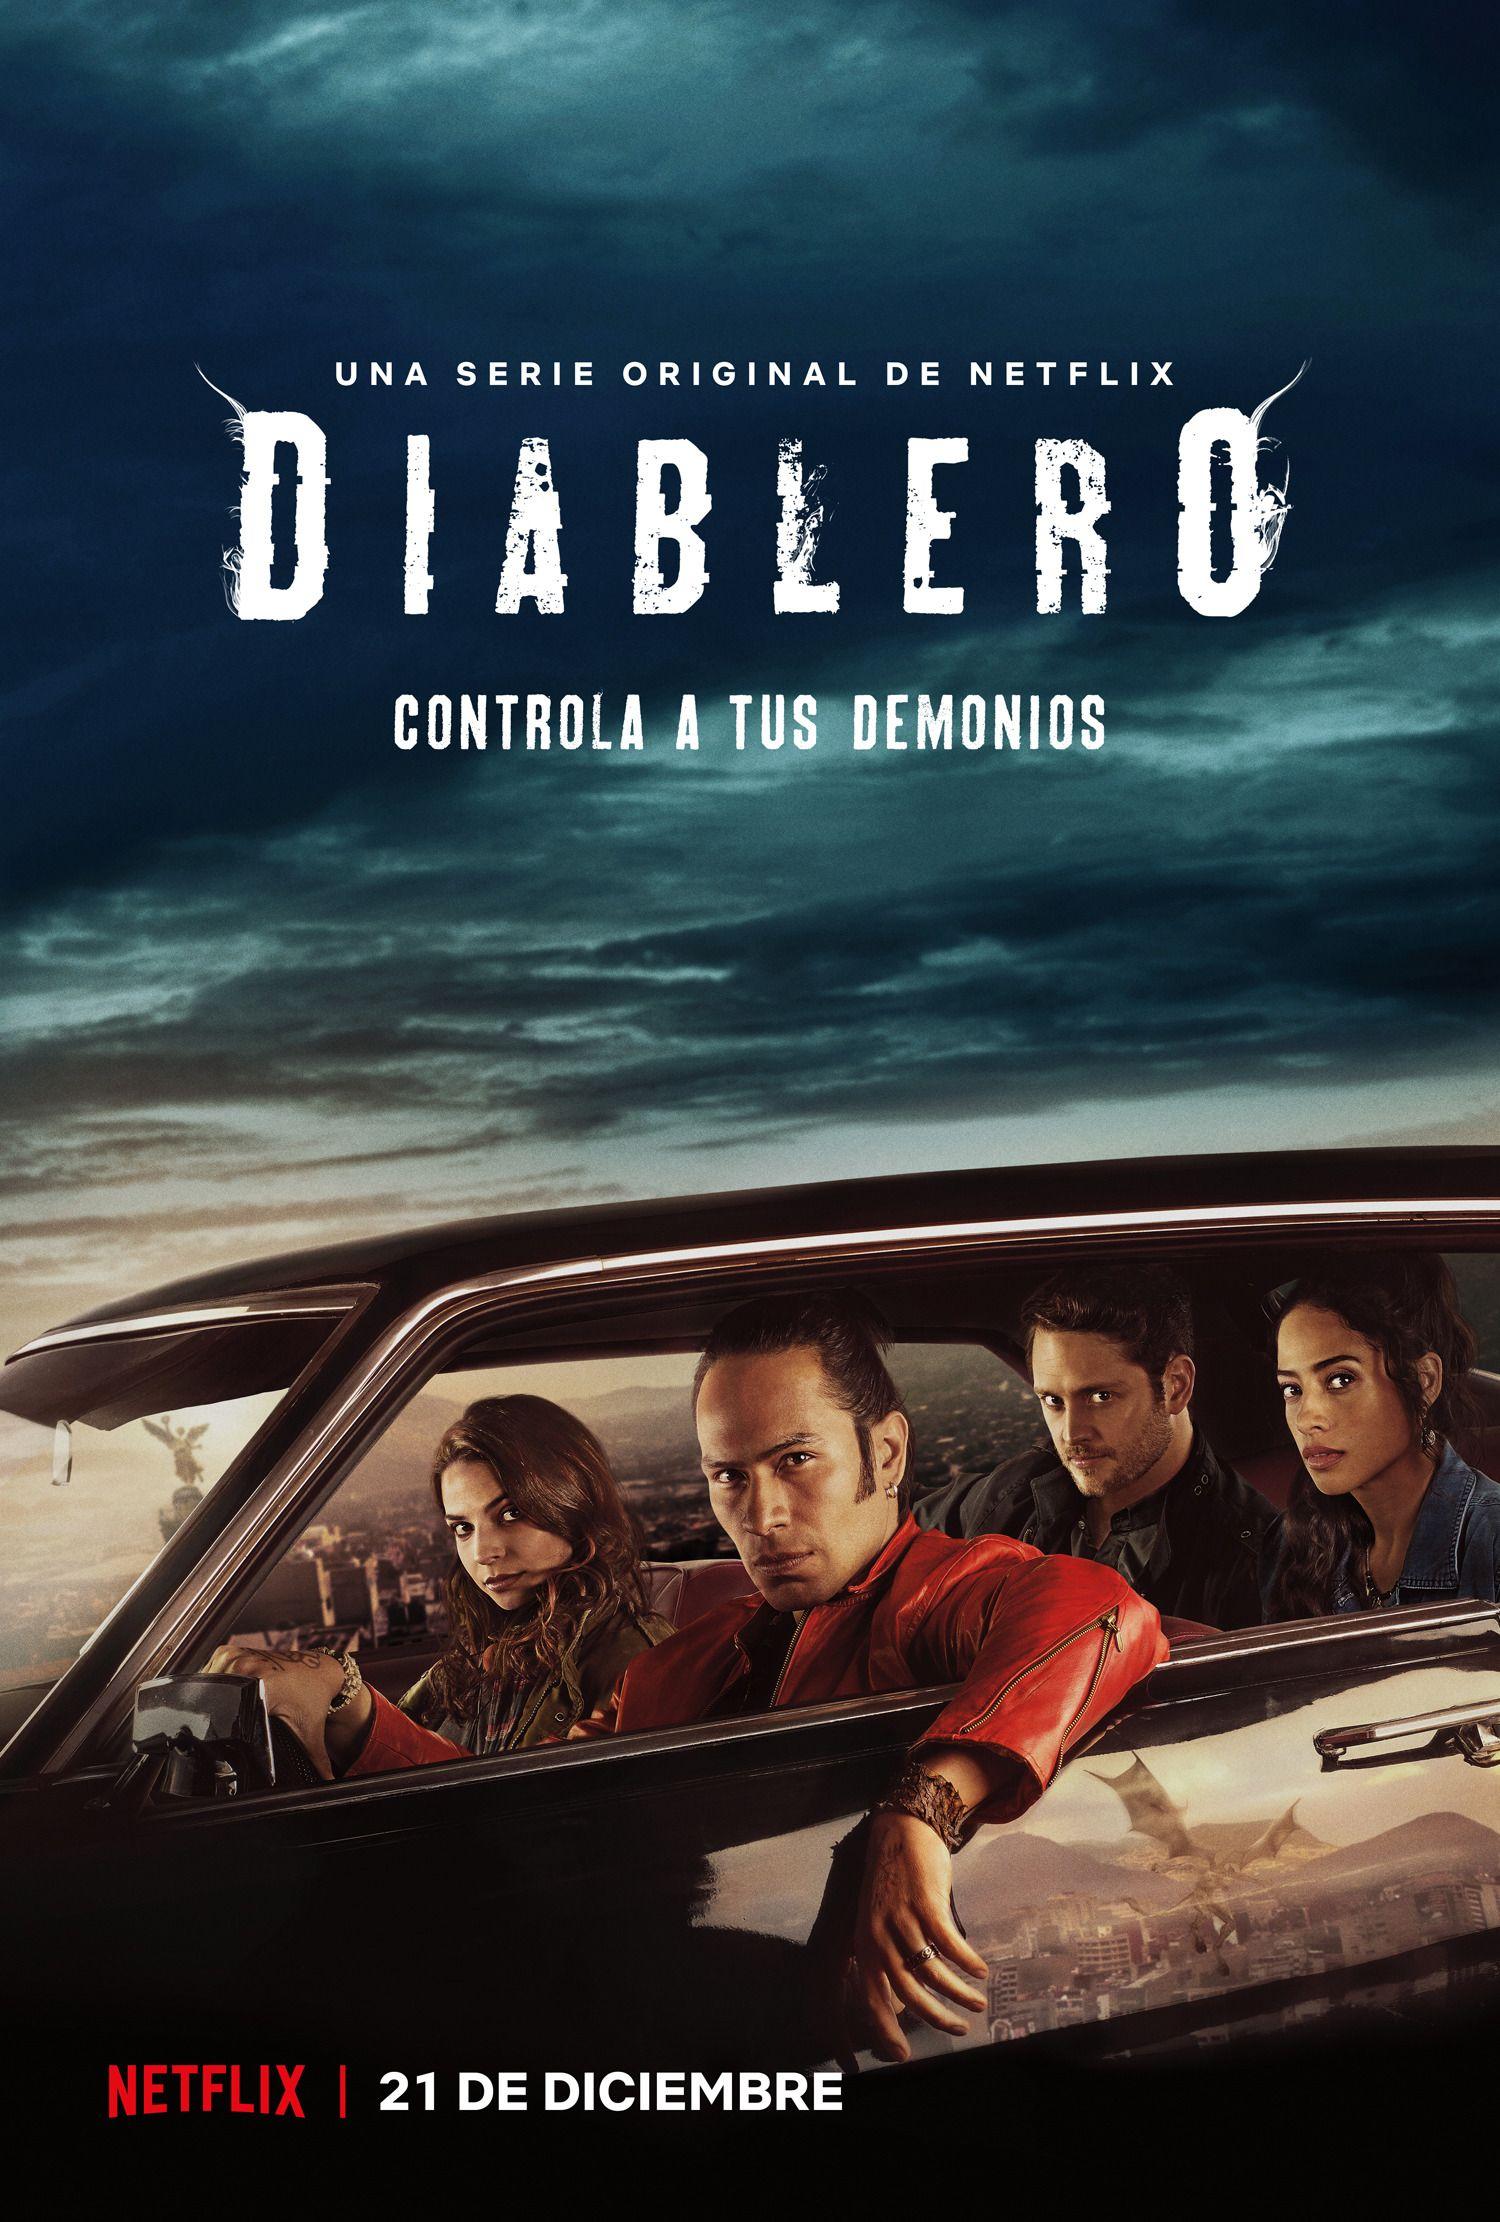 Diablero Netflix Poster.jpg